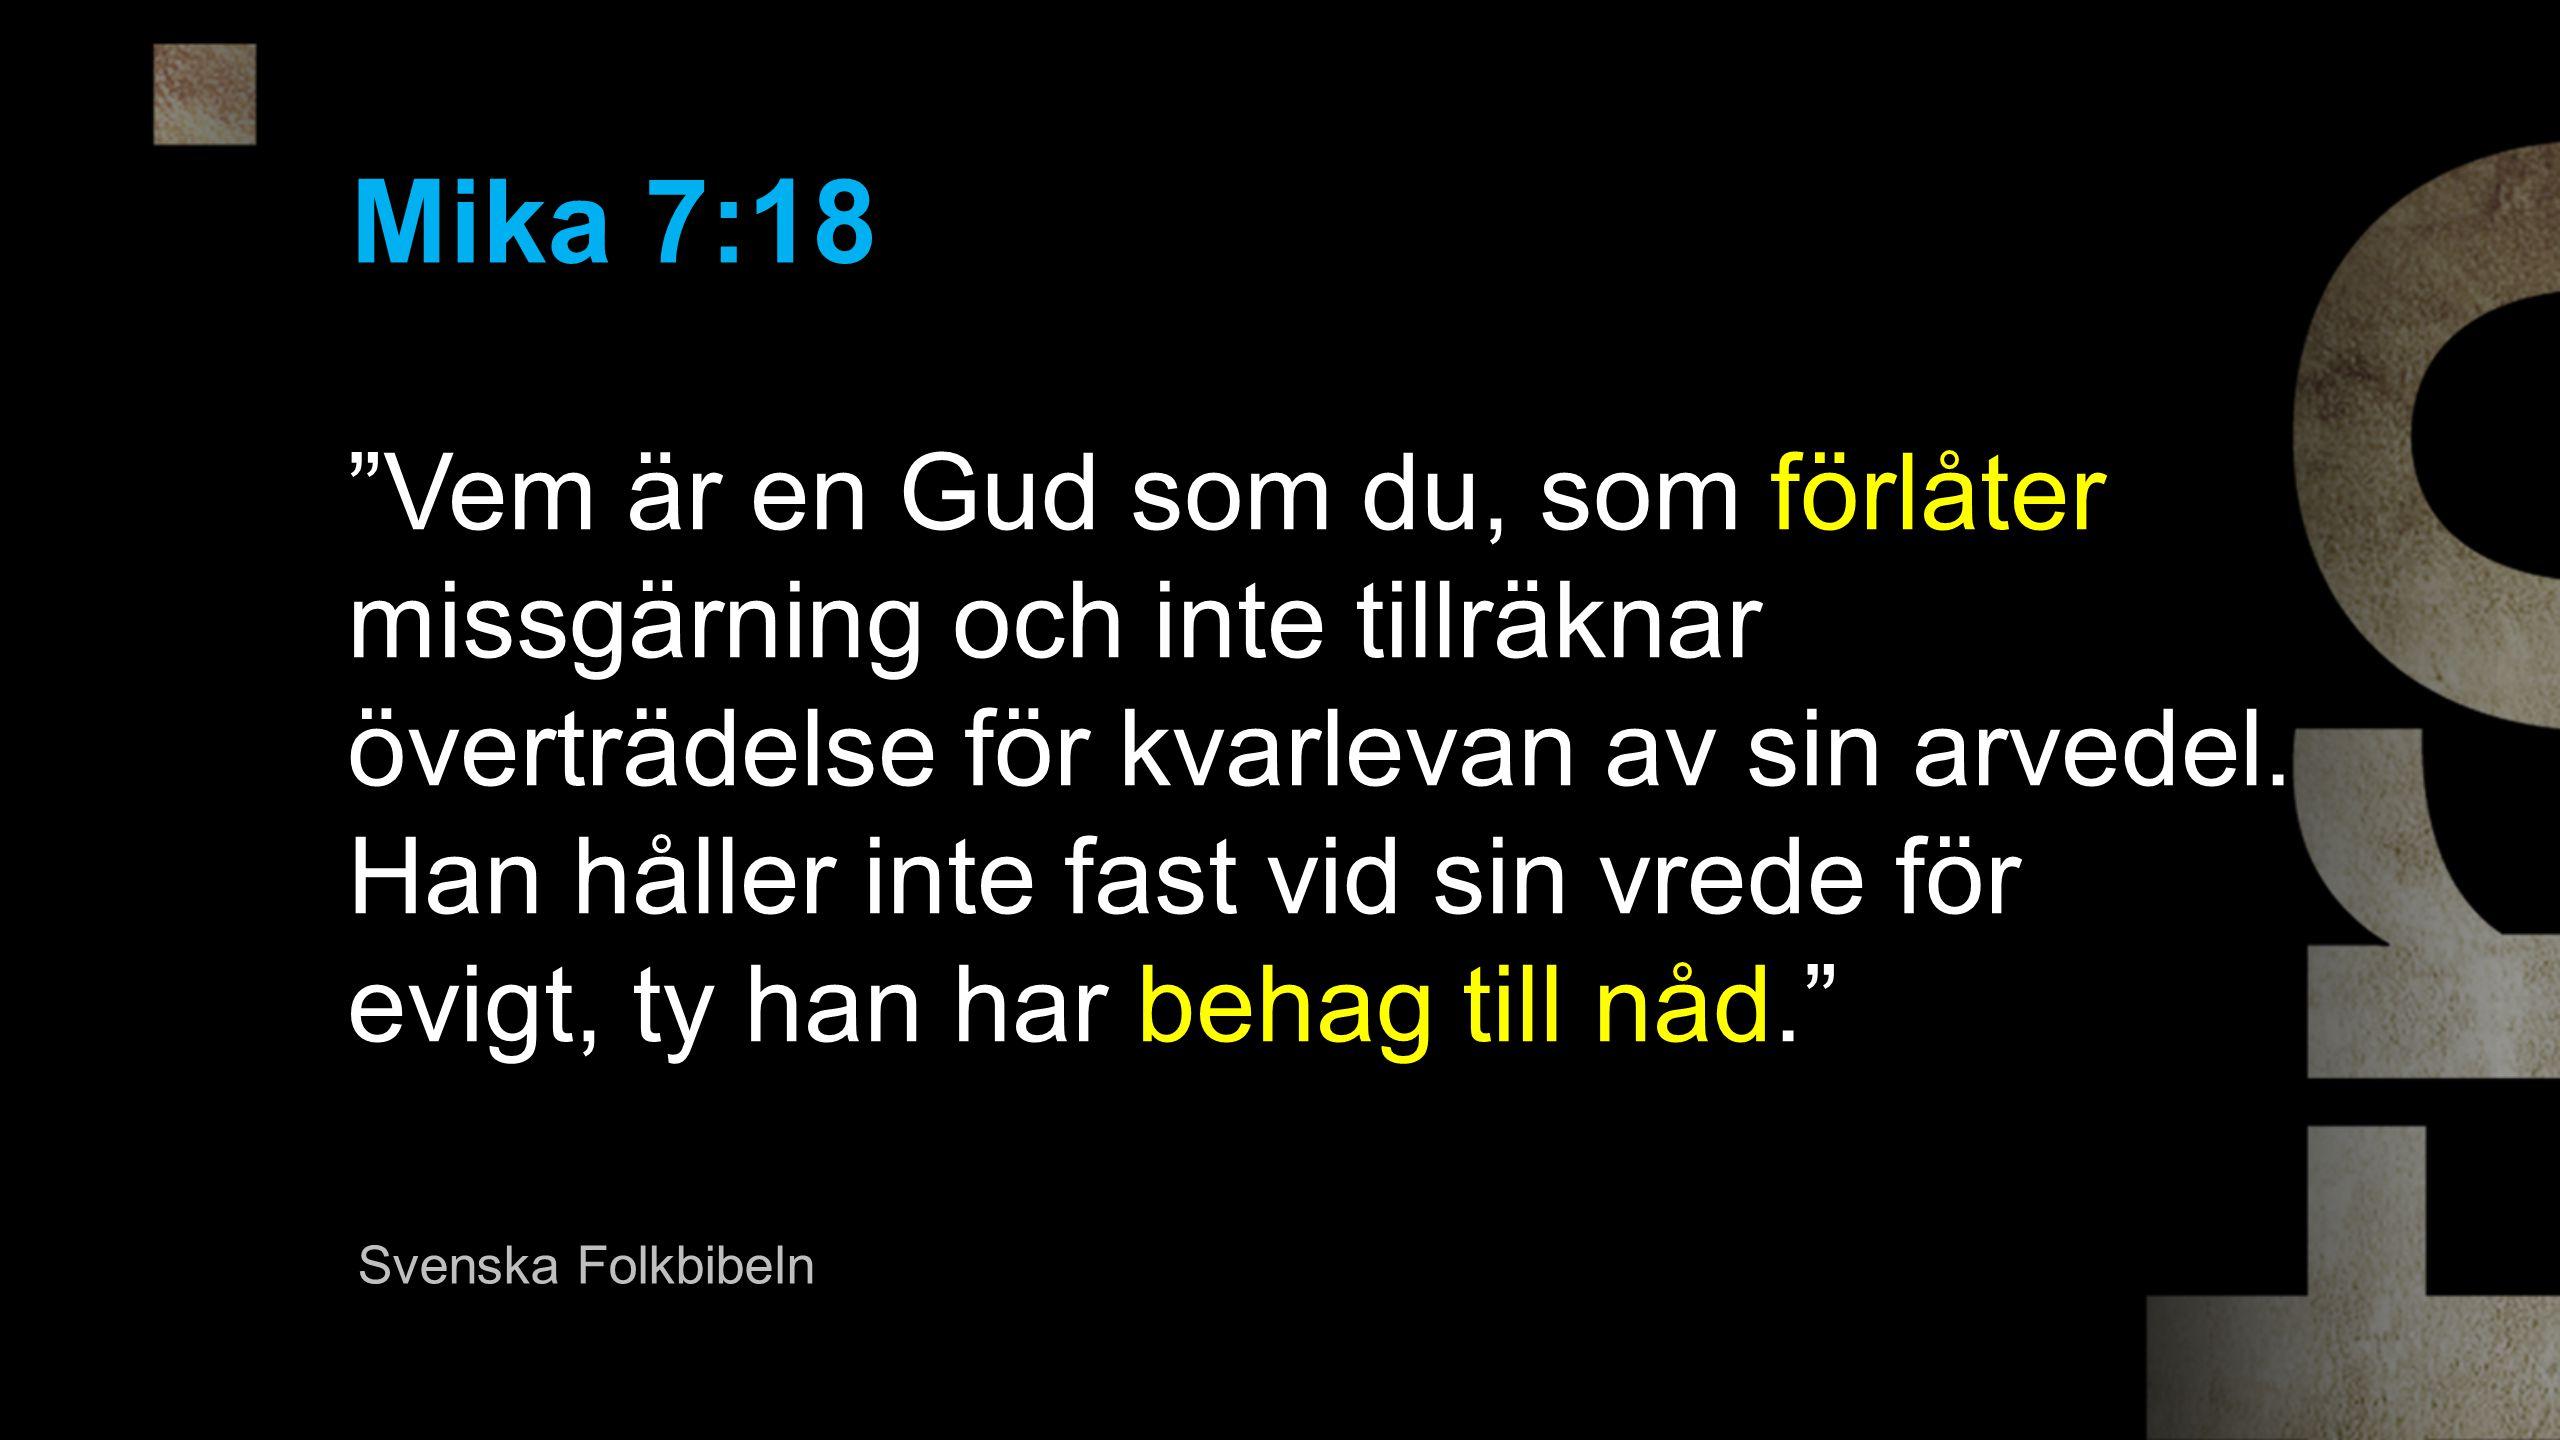 Mika 7:18